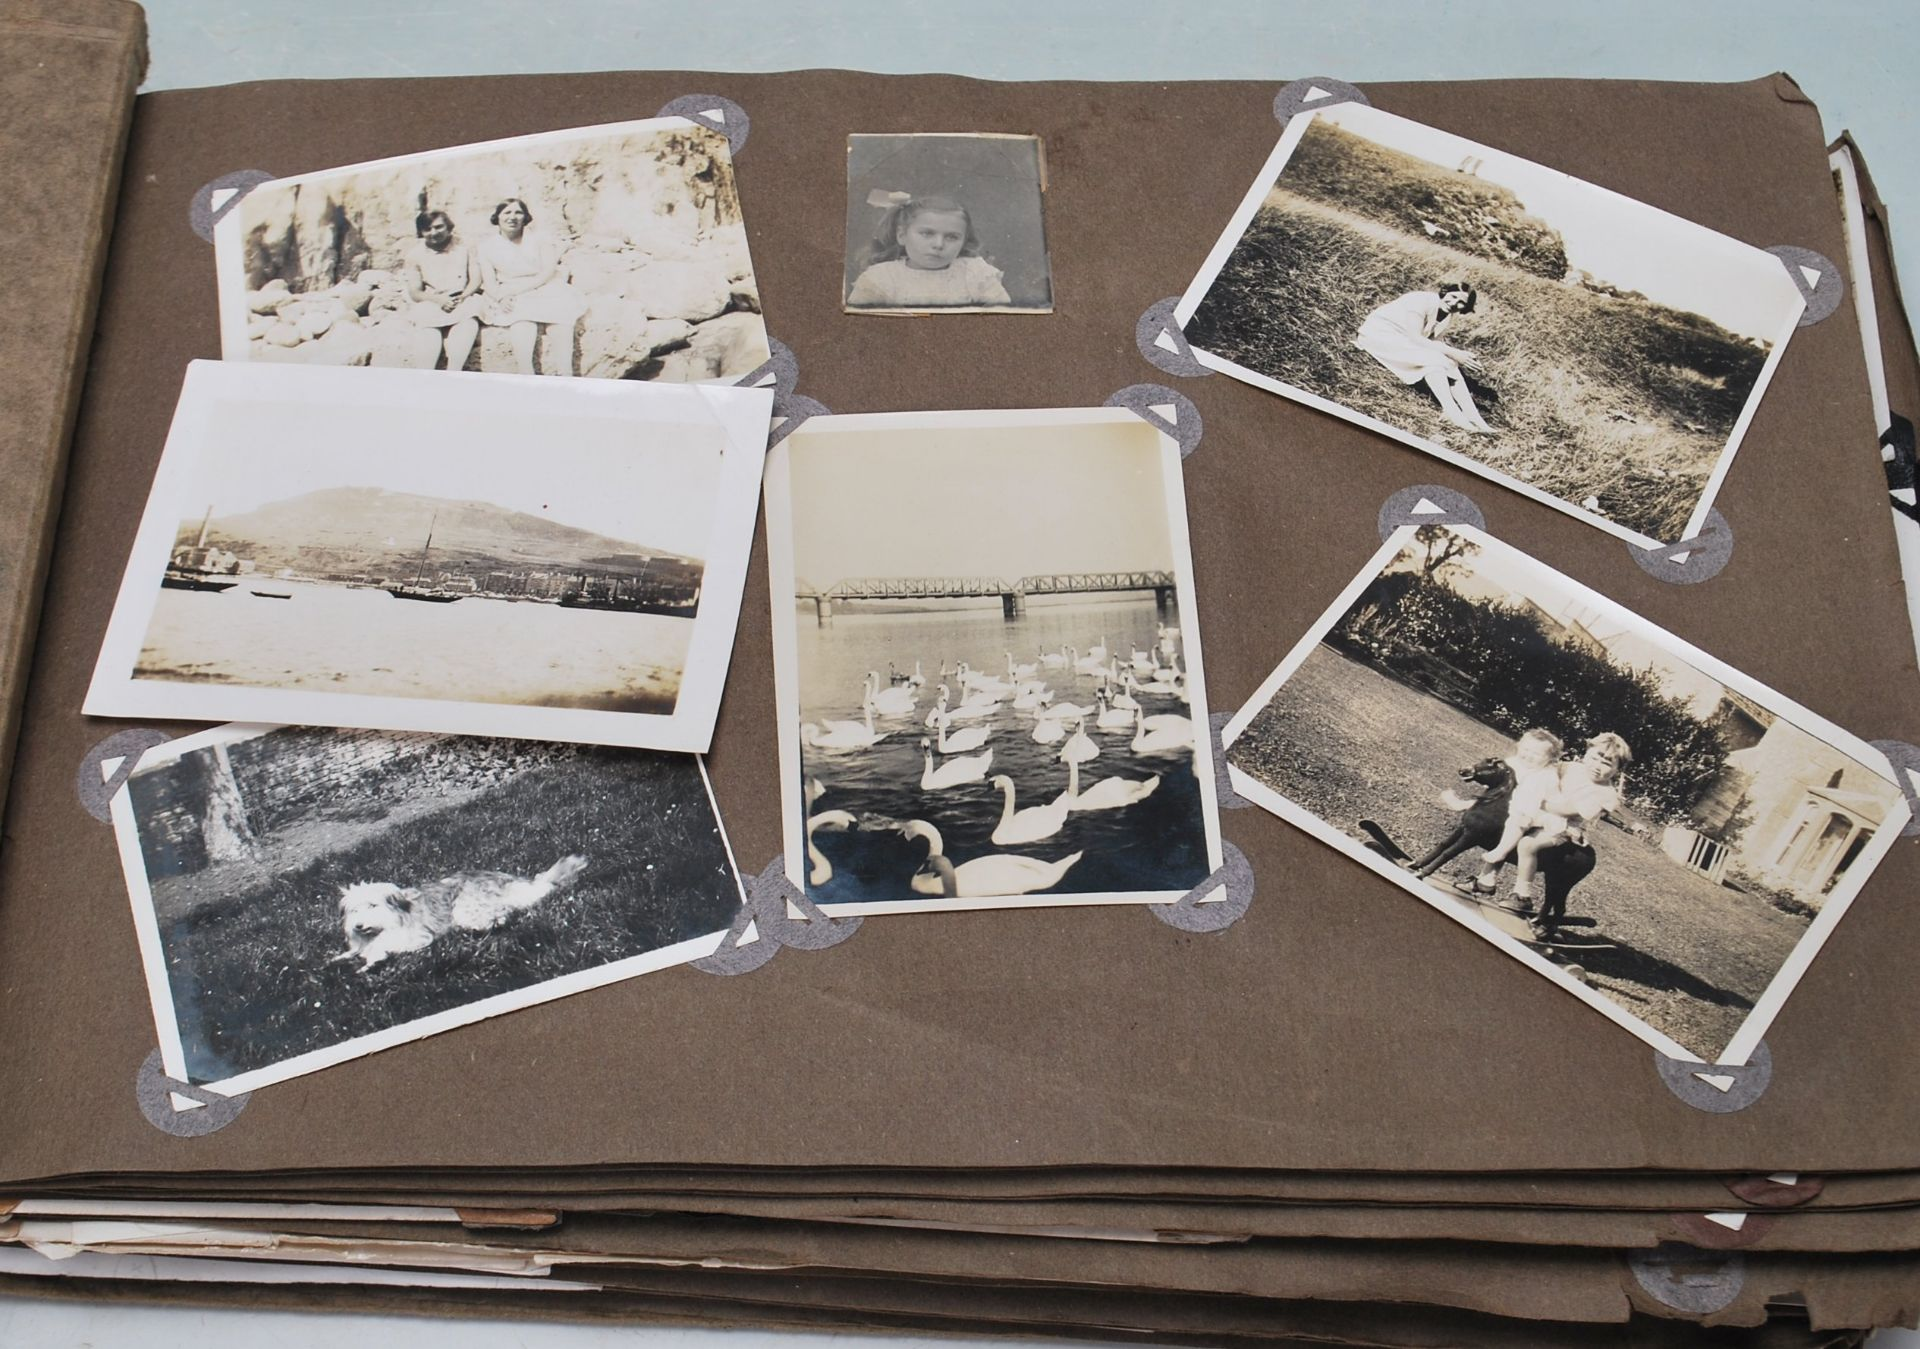 EARLY 20TH CENTURY BLACK AND WHITE PHOTO ALBUM